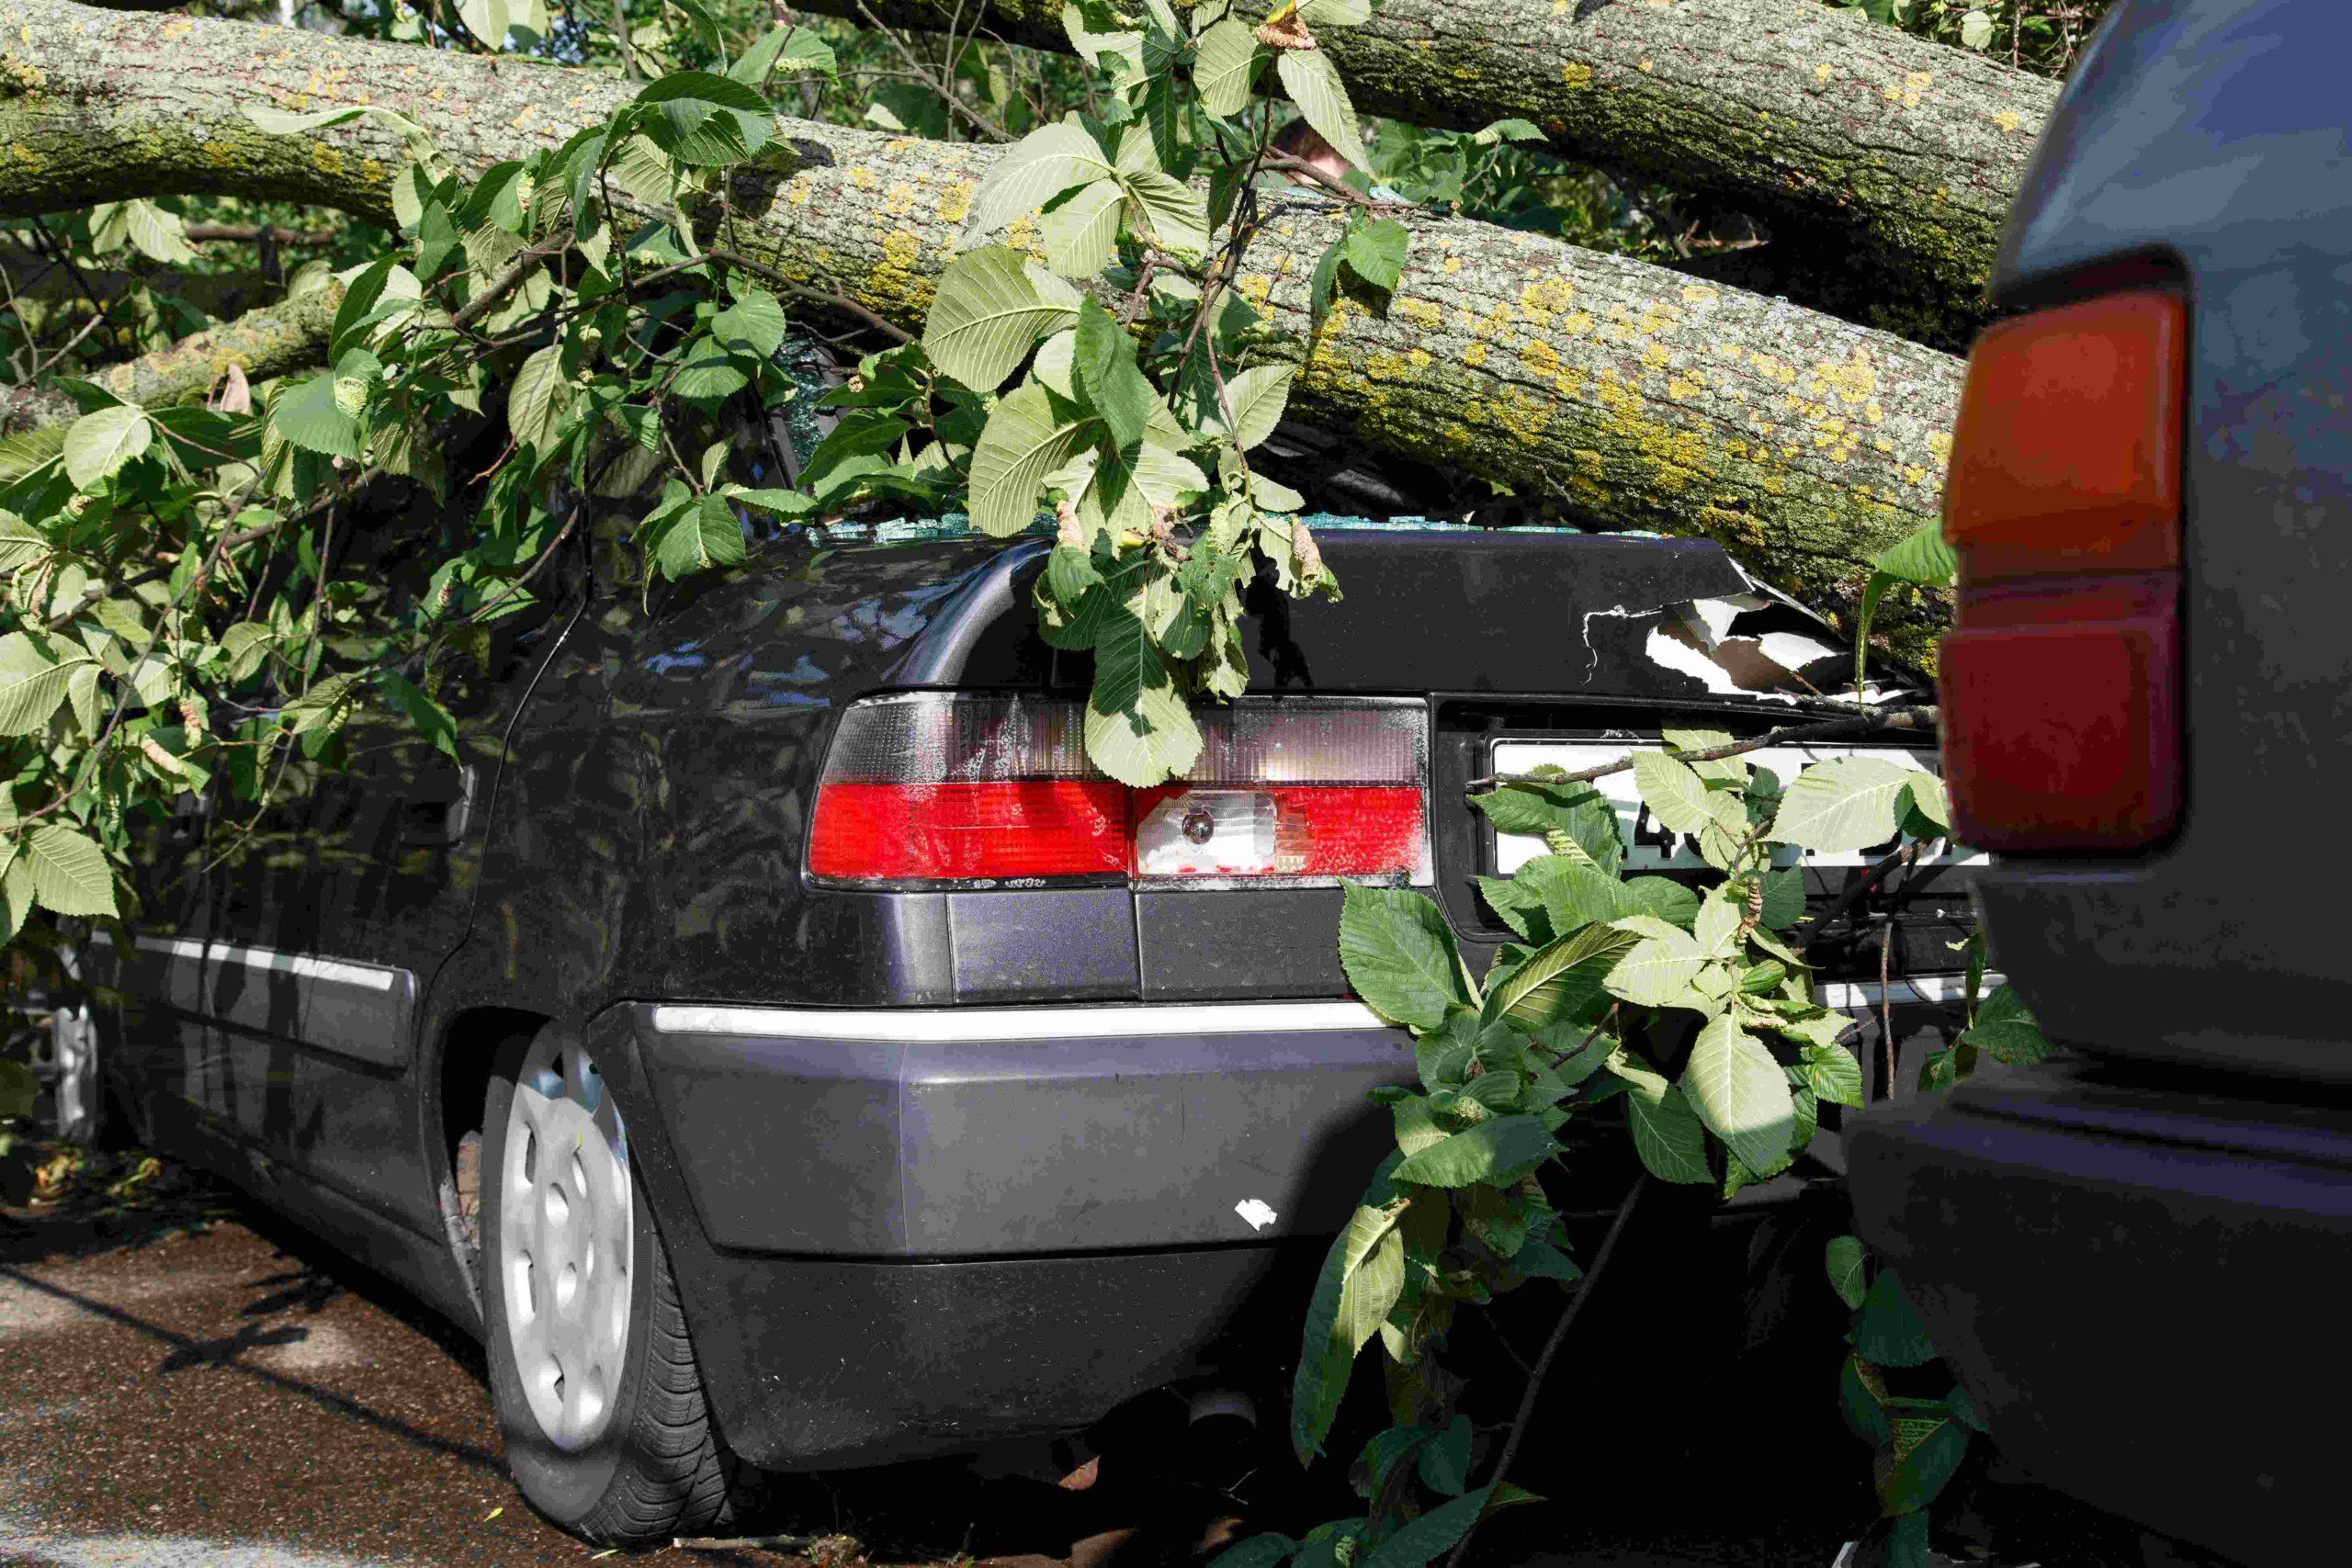 Tree Services Sandy Springs GA -Emergency 3